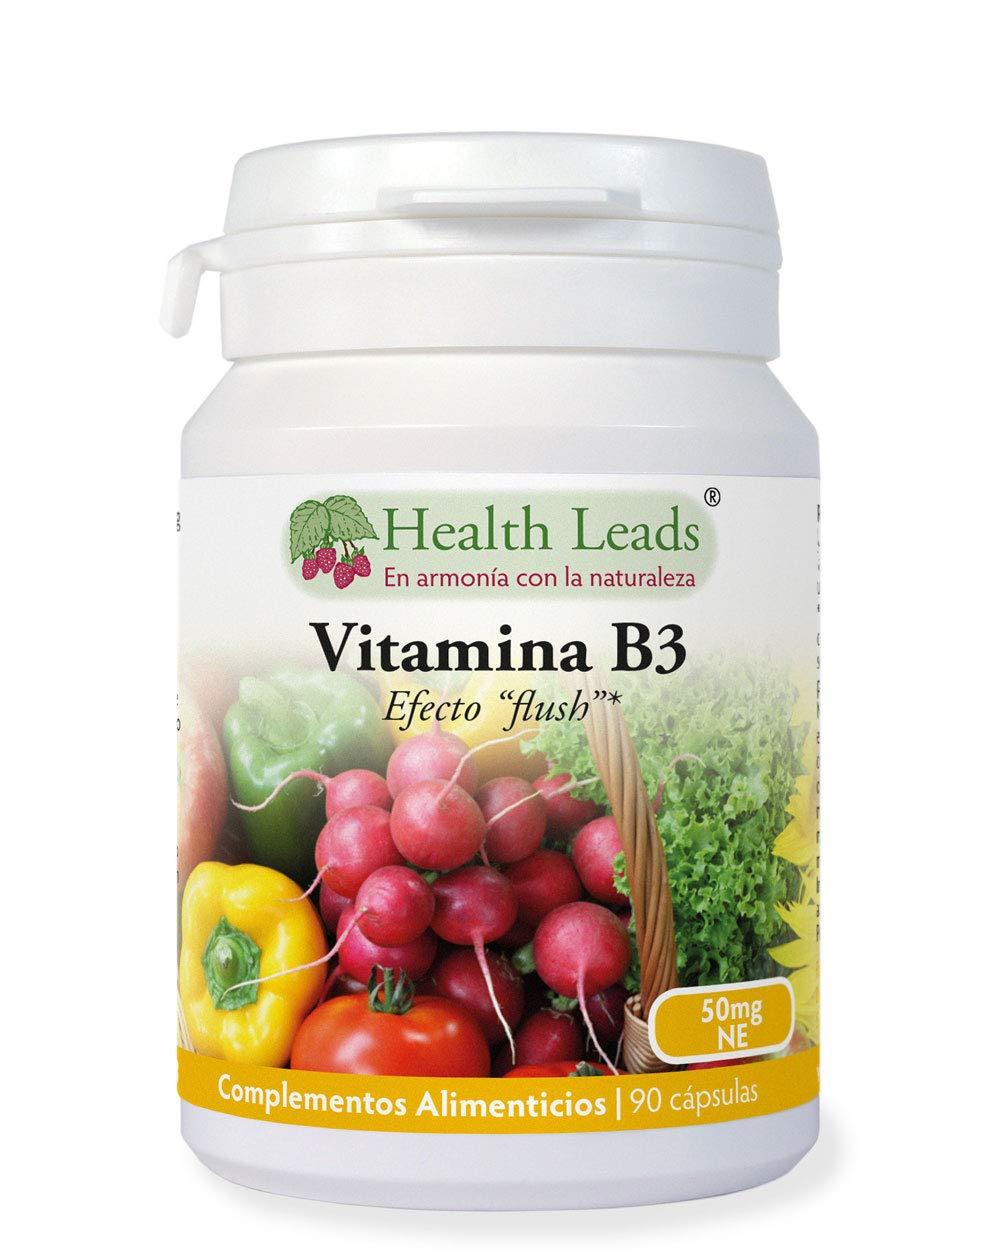 Vitamina B3 niacina/ácido nicotínico (con efecto